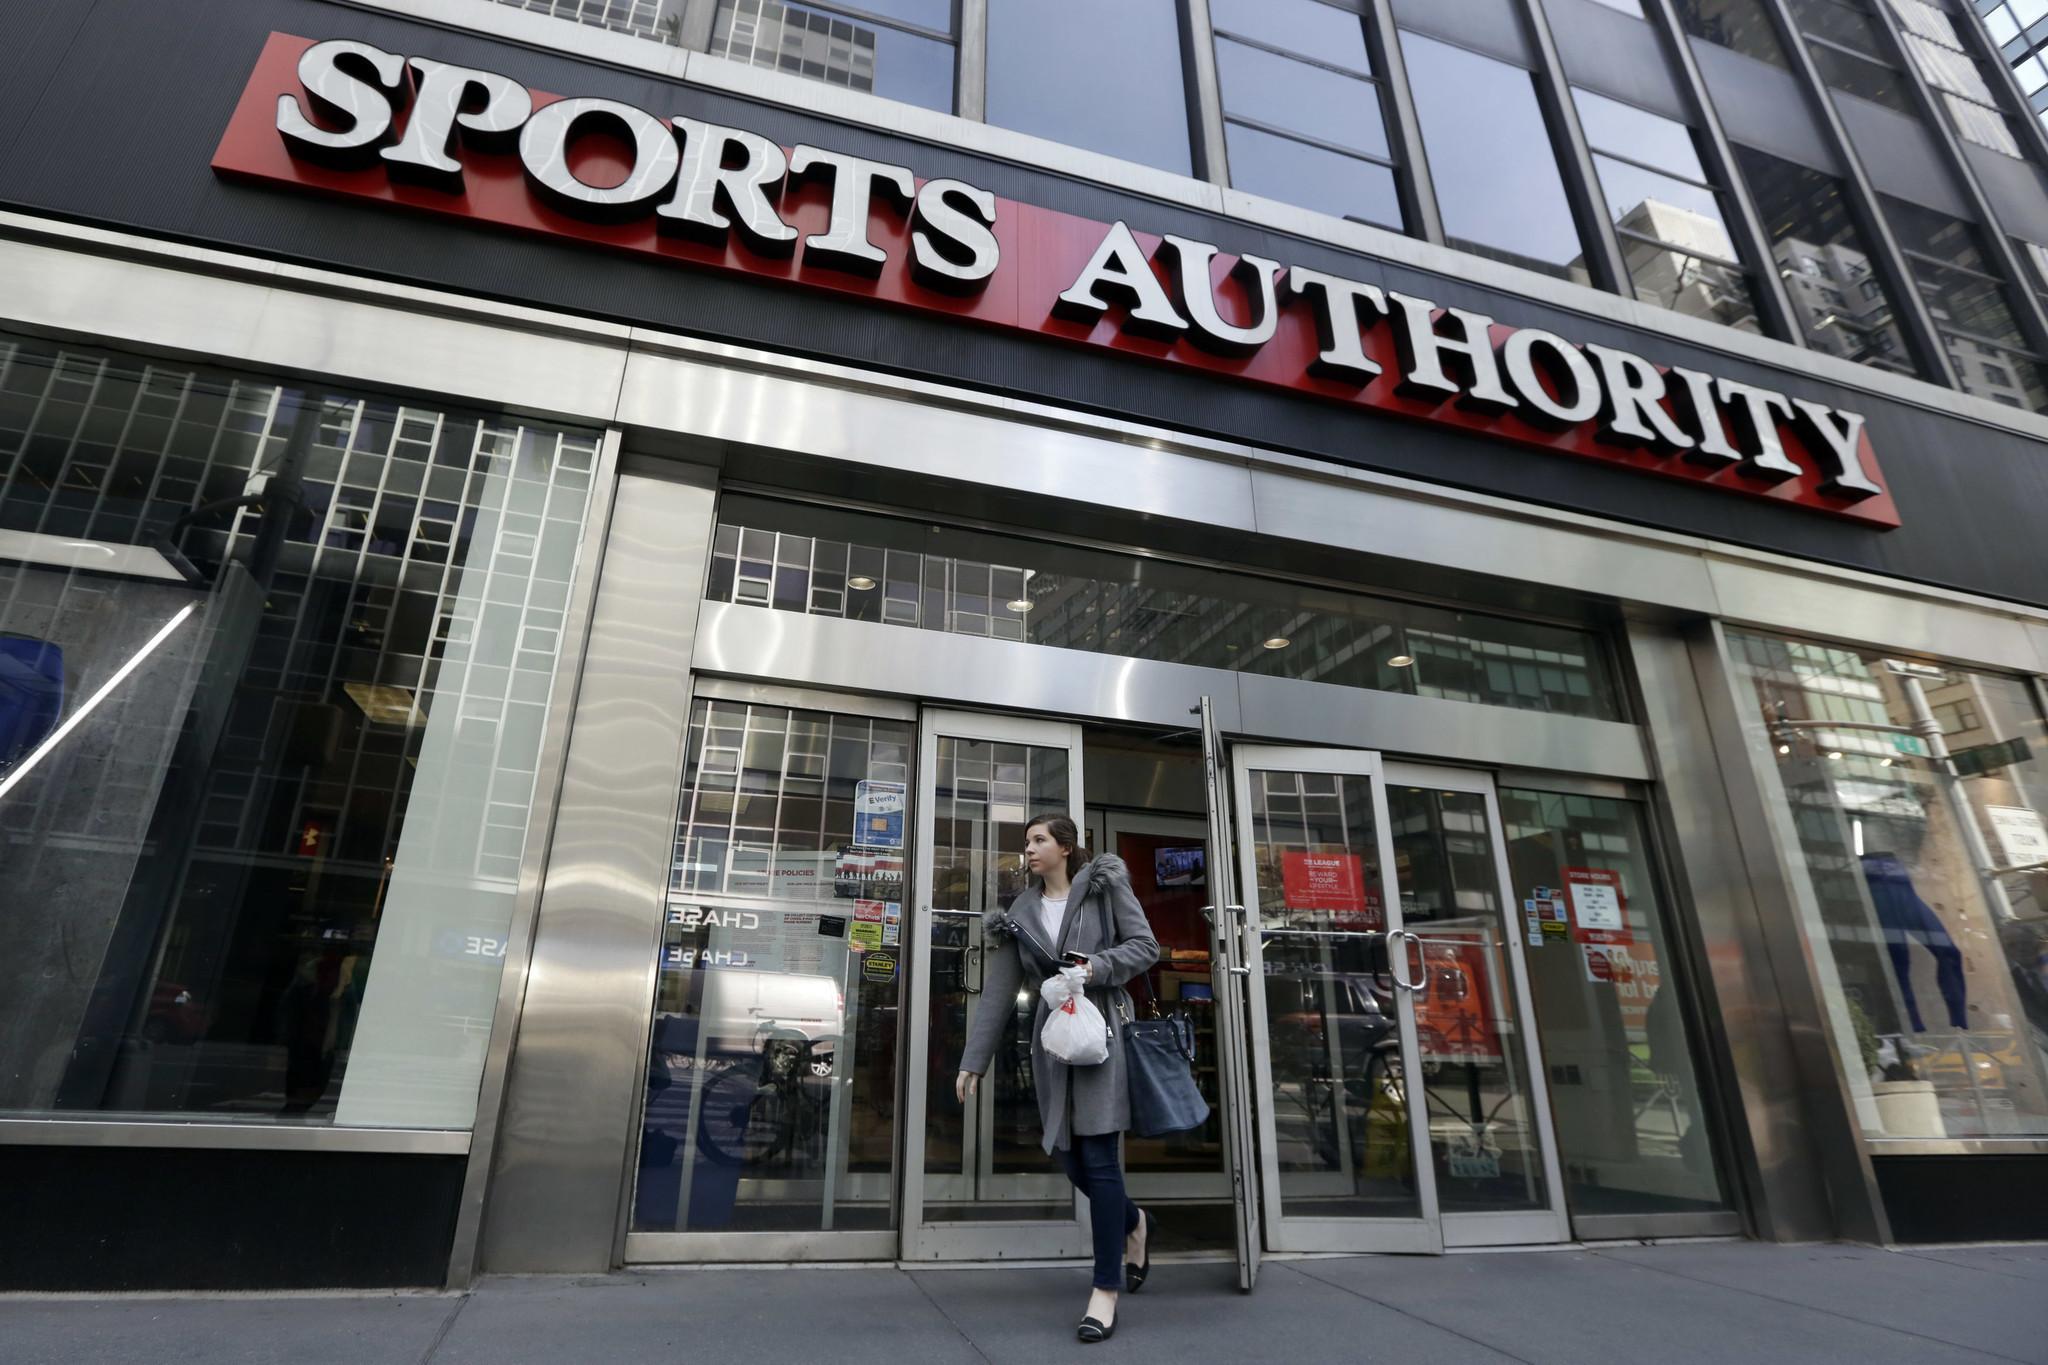 http://www.latimes.com/business/la-fi-sports-authority-20160303-story.html